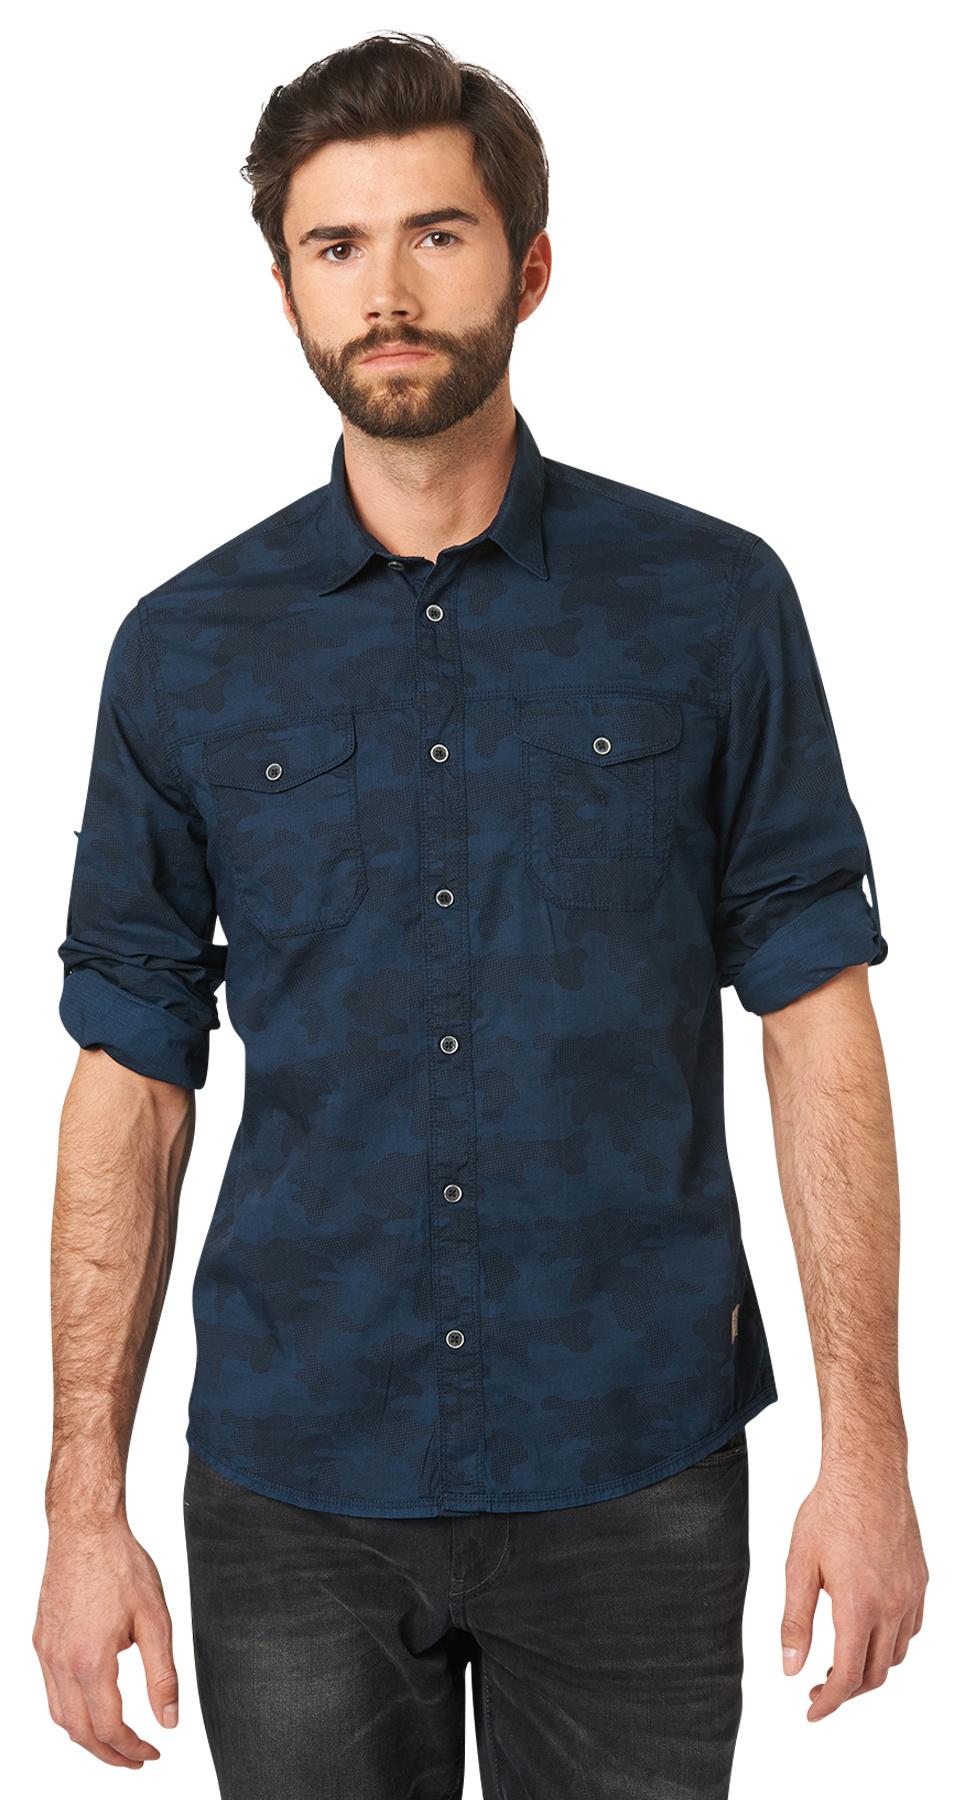 Tom Tailor pánská košile 20332180110/6740 Modrá XXL